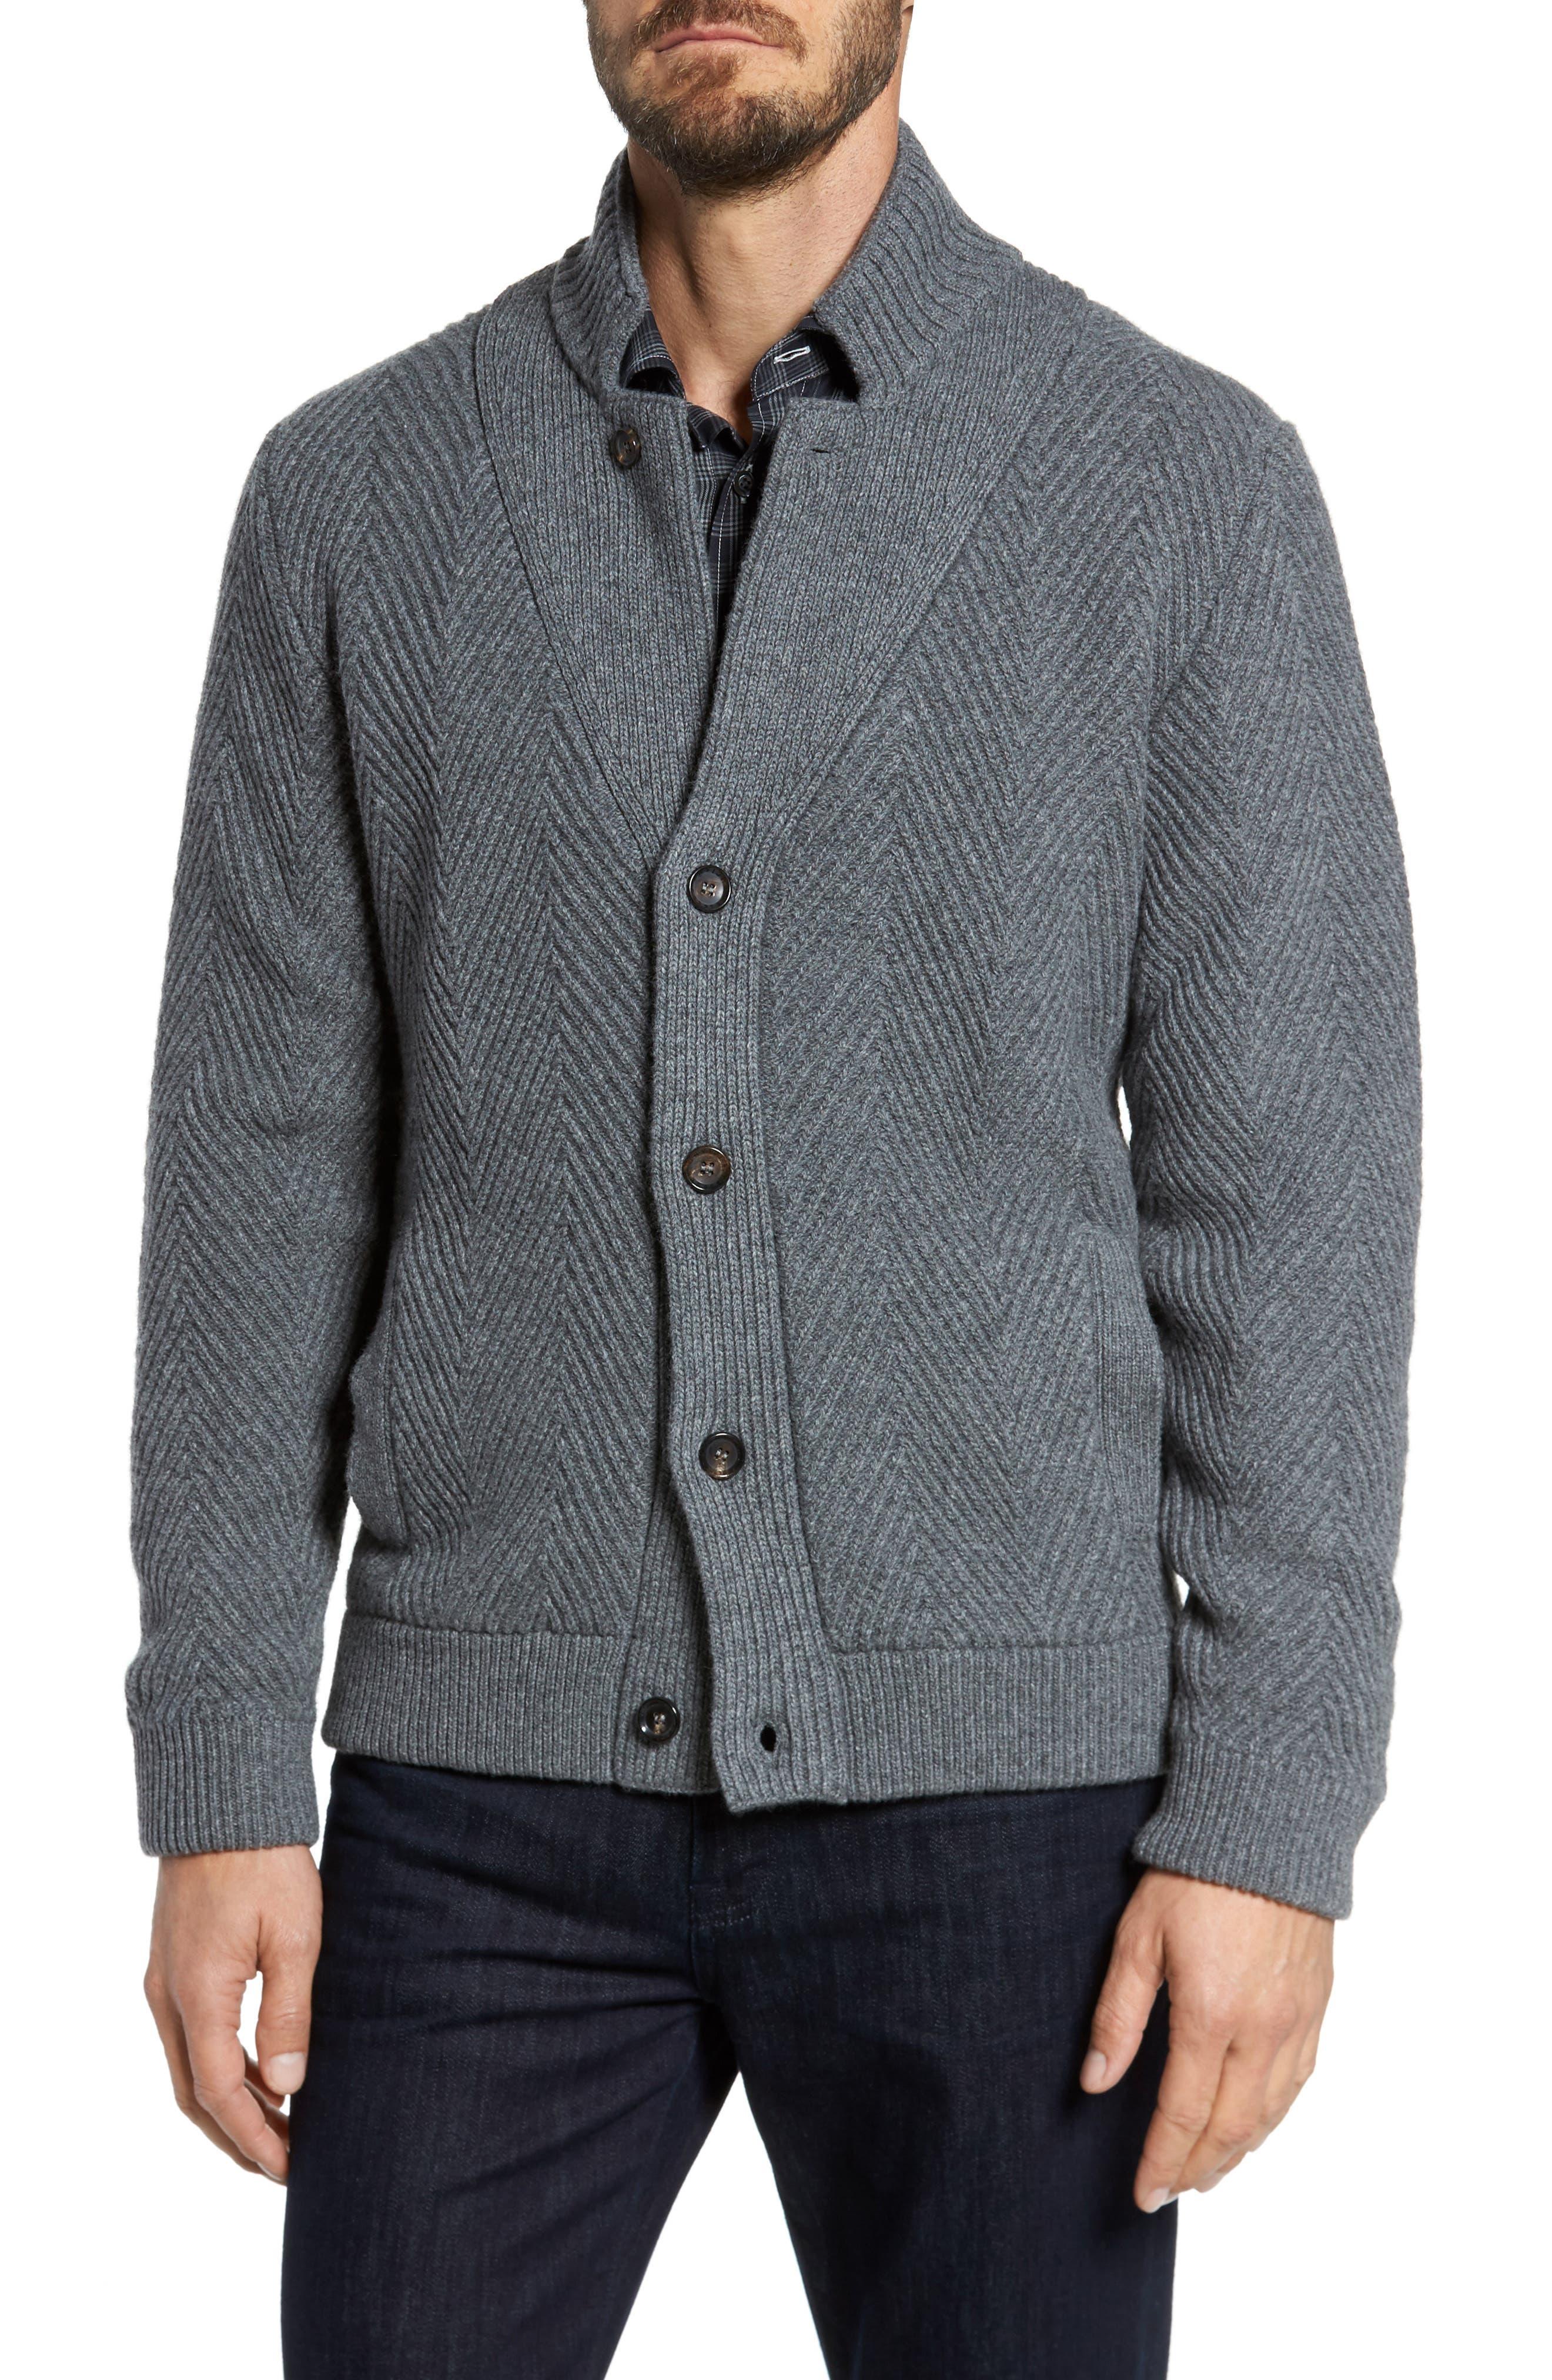 Luciano Barbera Herringbone Wool & Cashmere Cardigan